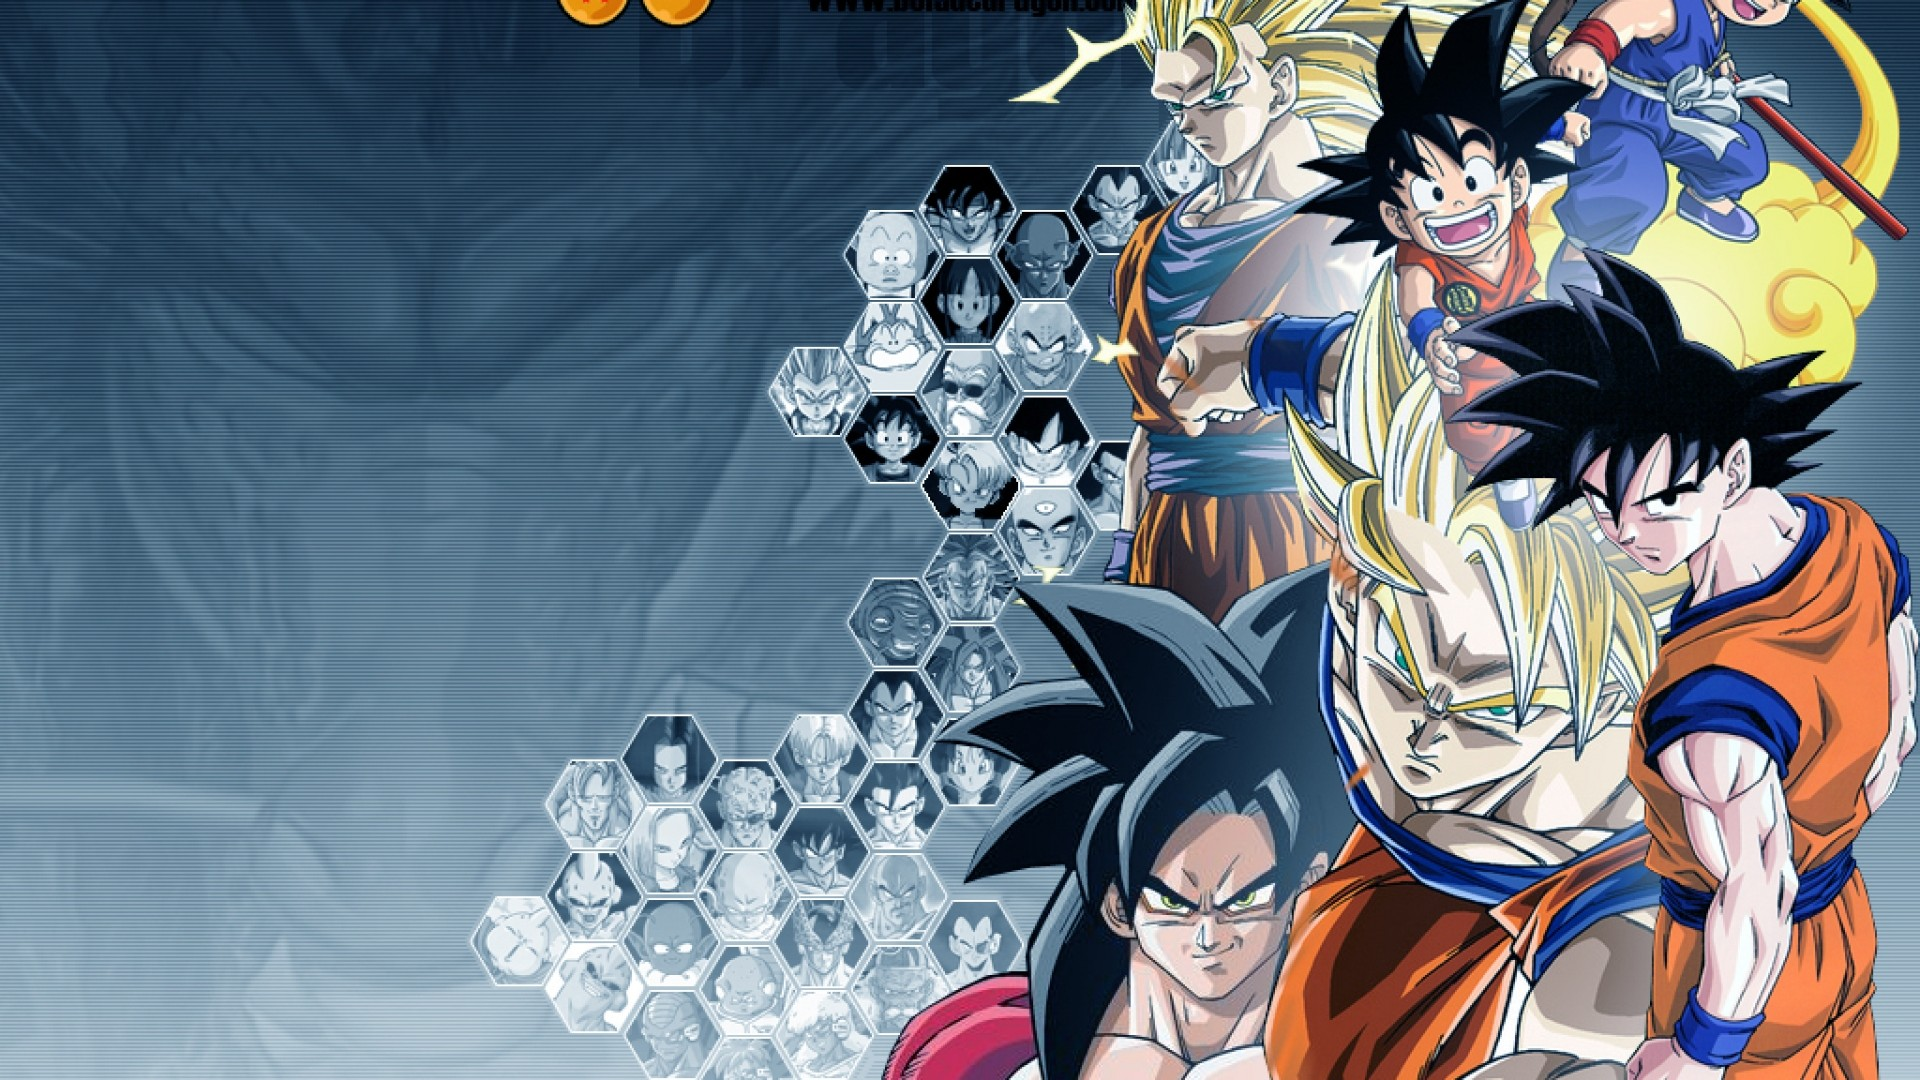 46+ Best Goku Wallpapers on WallpaperSafari